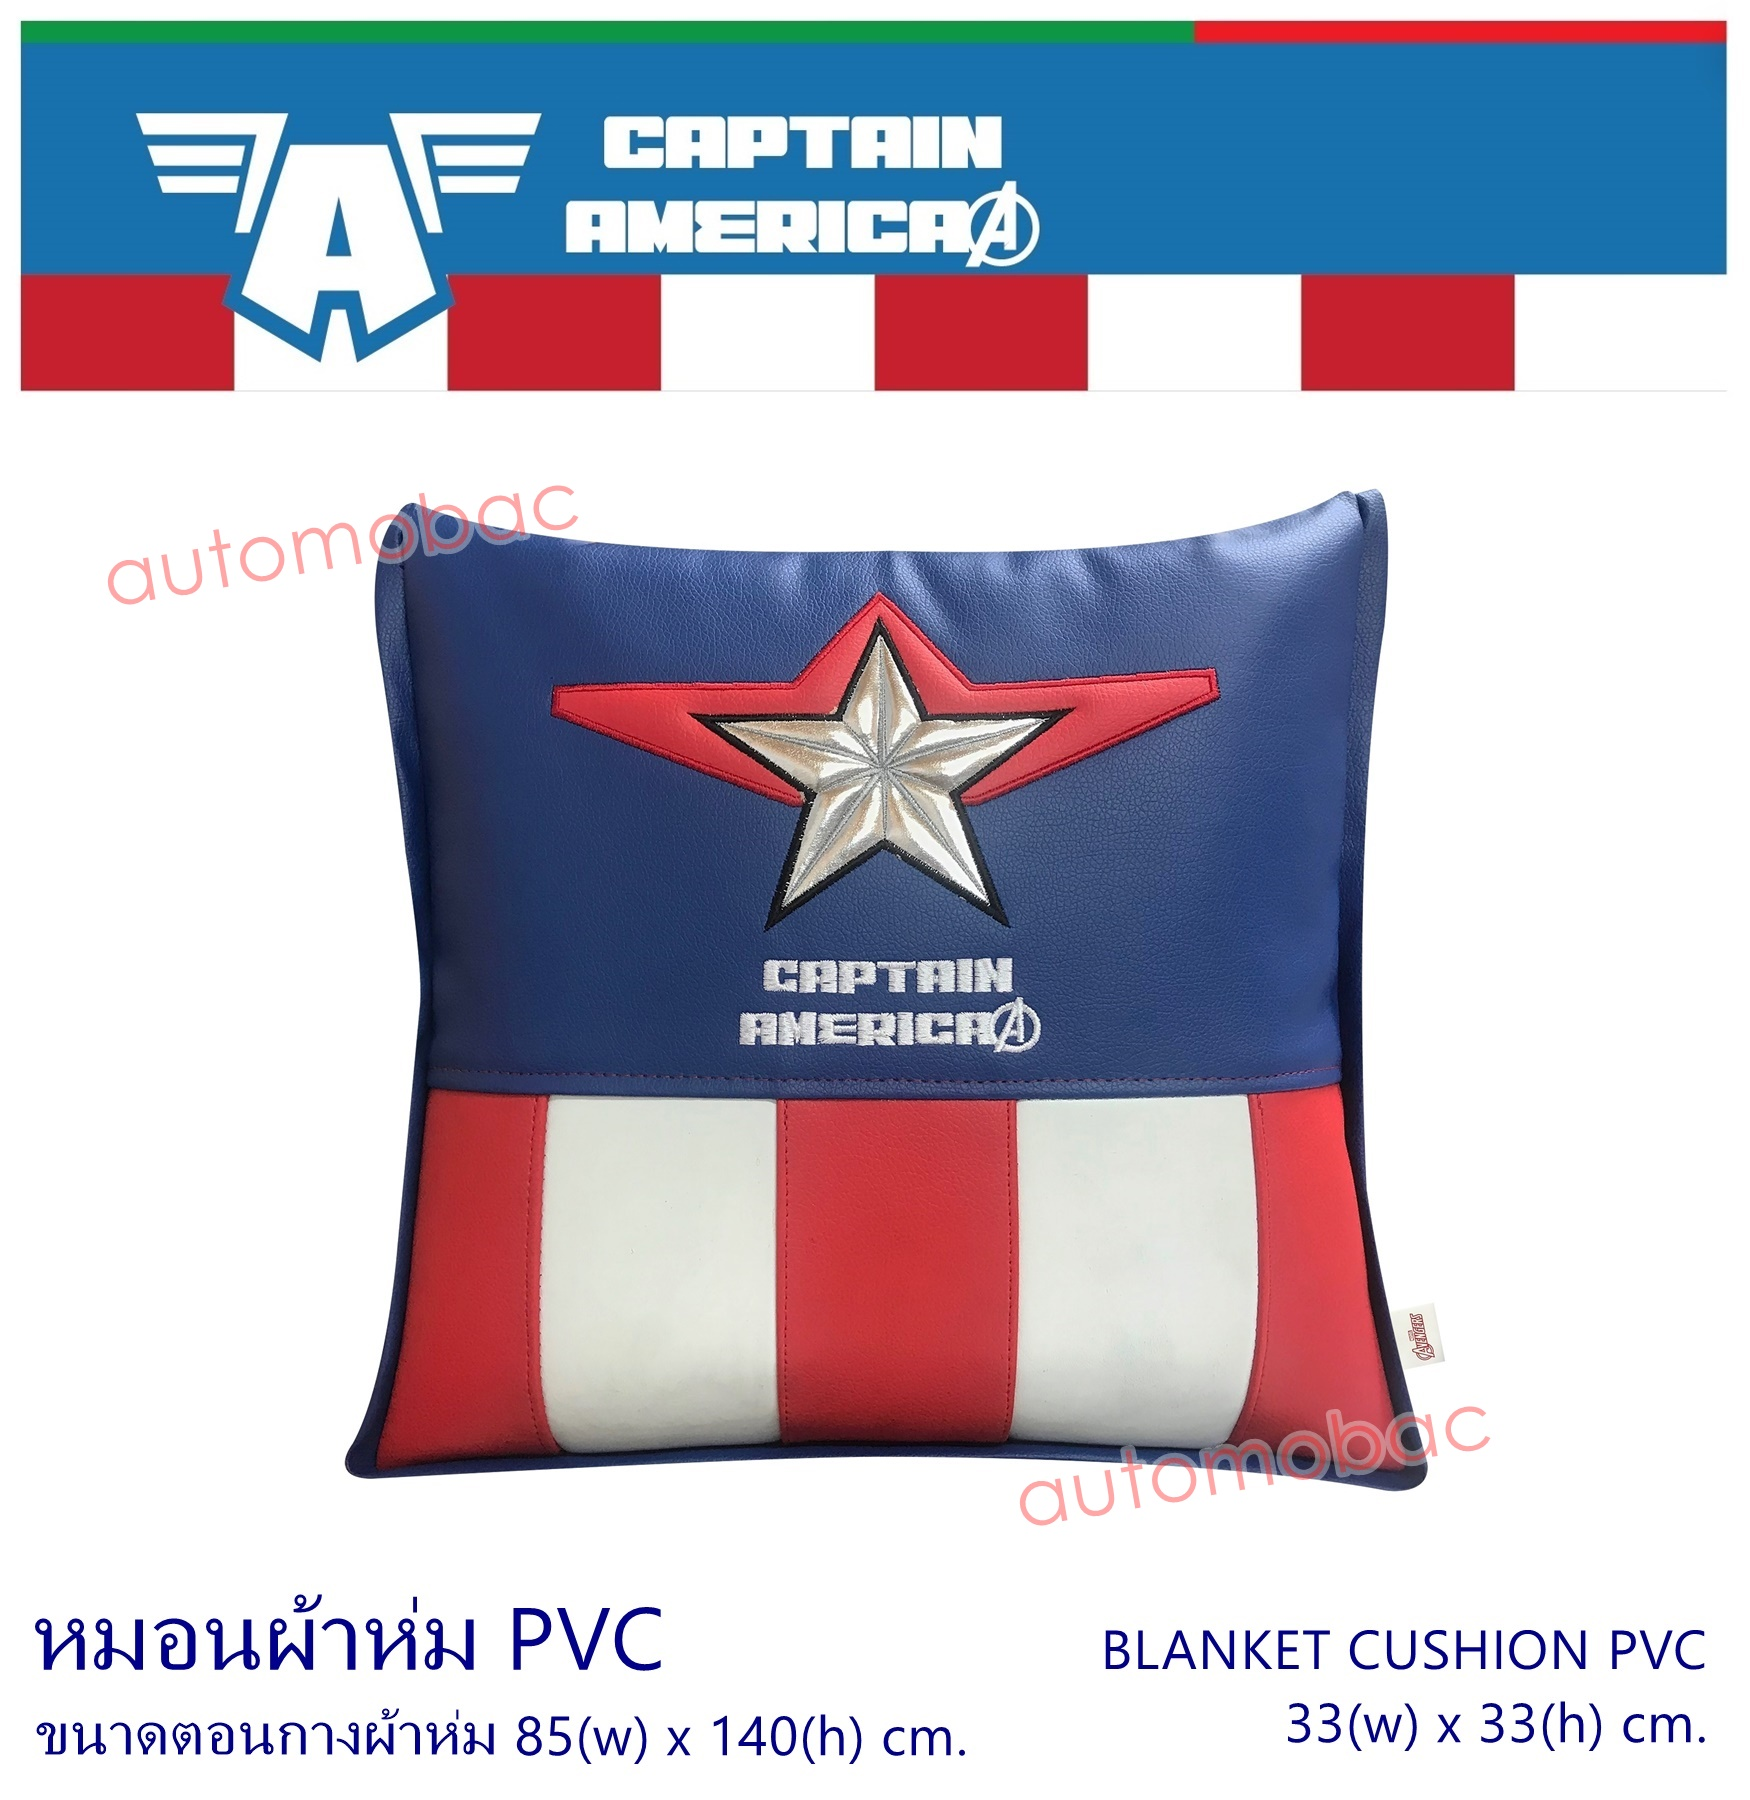 CAPTAIN AMERICA หมอนผ้าห่ม 2 in 1 ผลิตจาก PVC เกรด A ขนาดประมาณ 85x140 cm. ใช้ได้ทั้งในรถ และในบ้าน